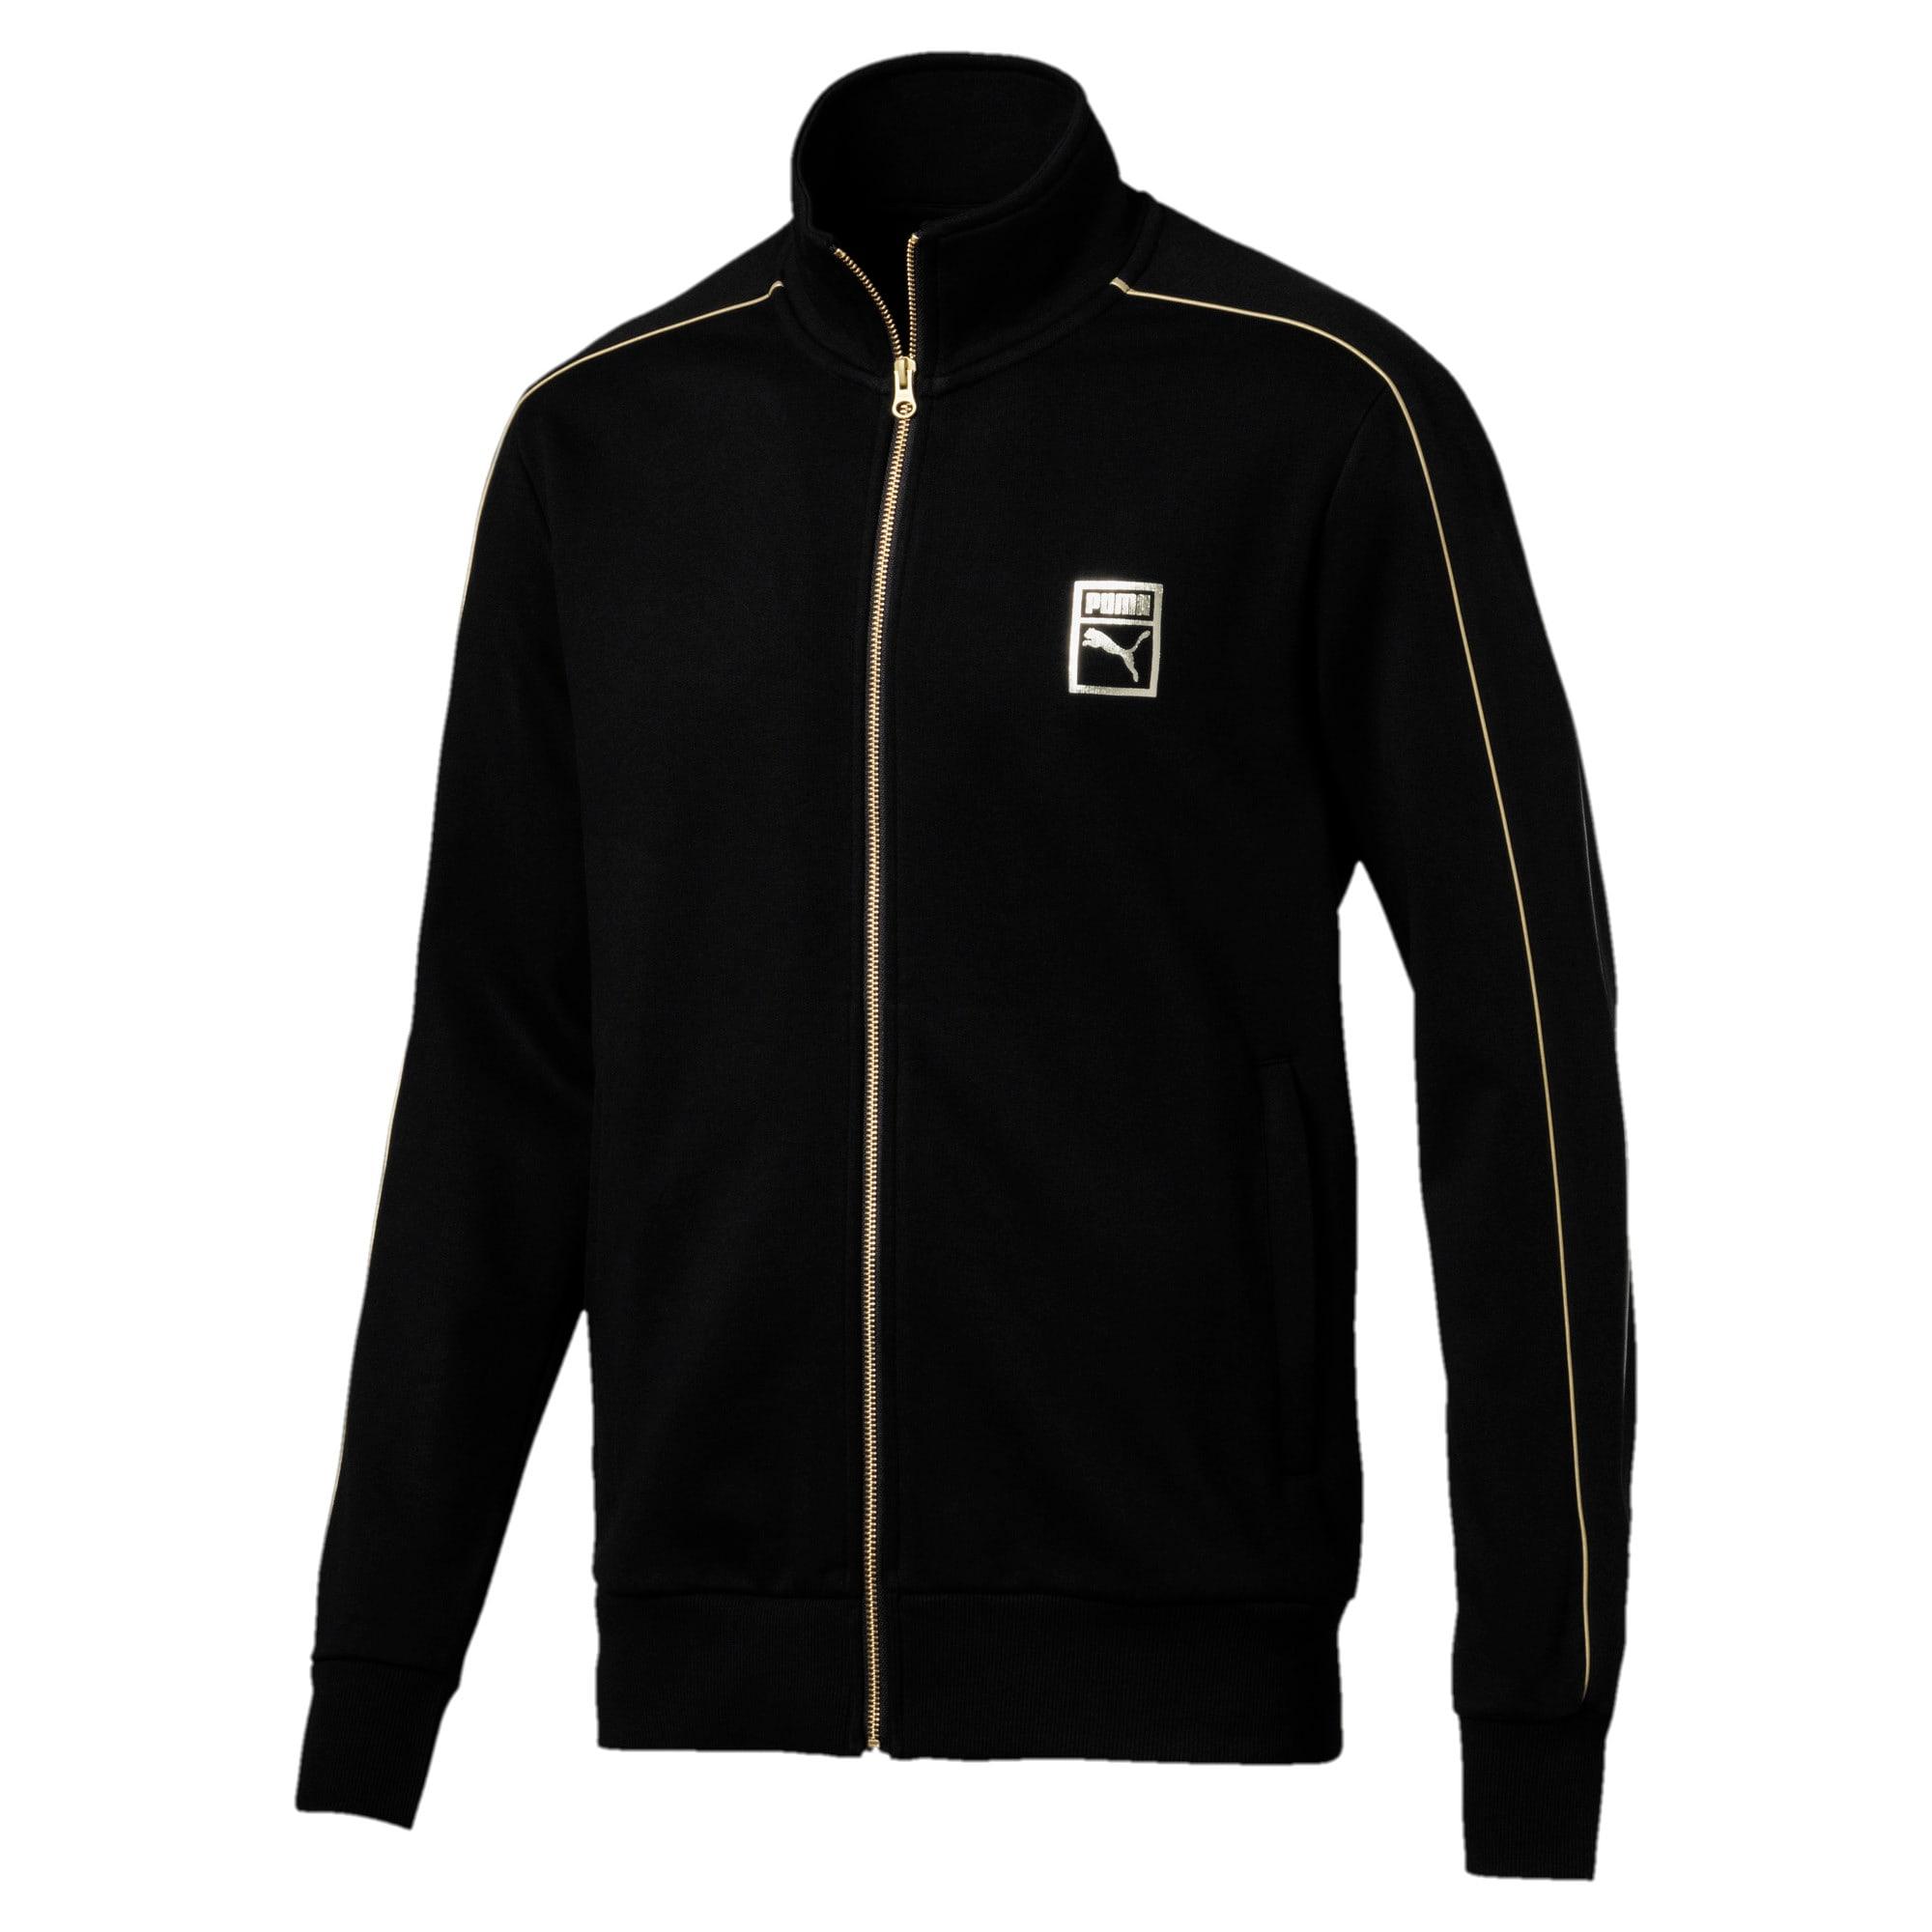 Thumbnail 1 of Chains T7 Zip-Up Men's Jacket, Puma Black, medium